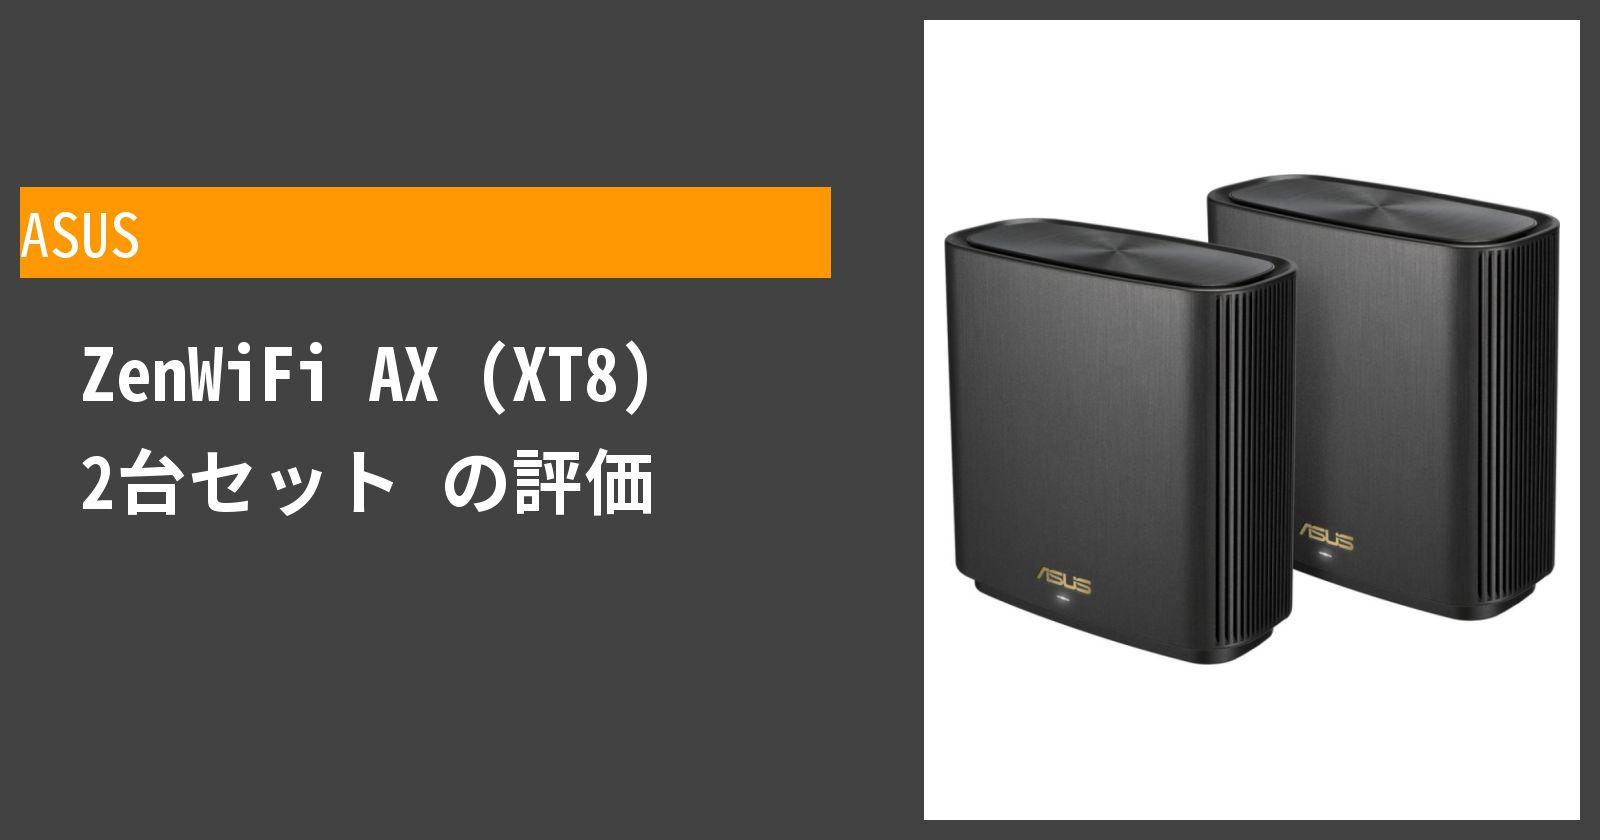 ZenWiFi AX (XT8) 2台セットを徹底評価